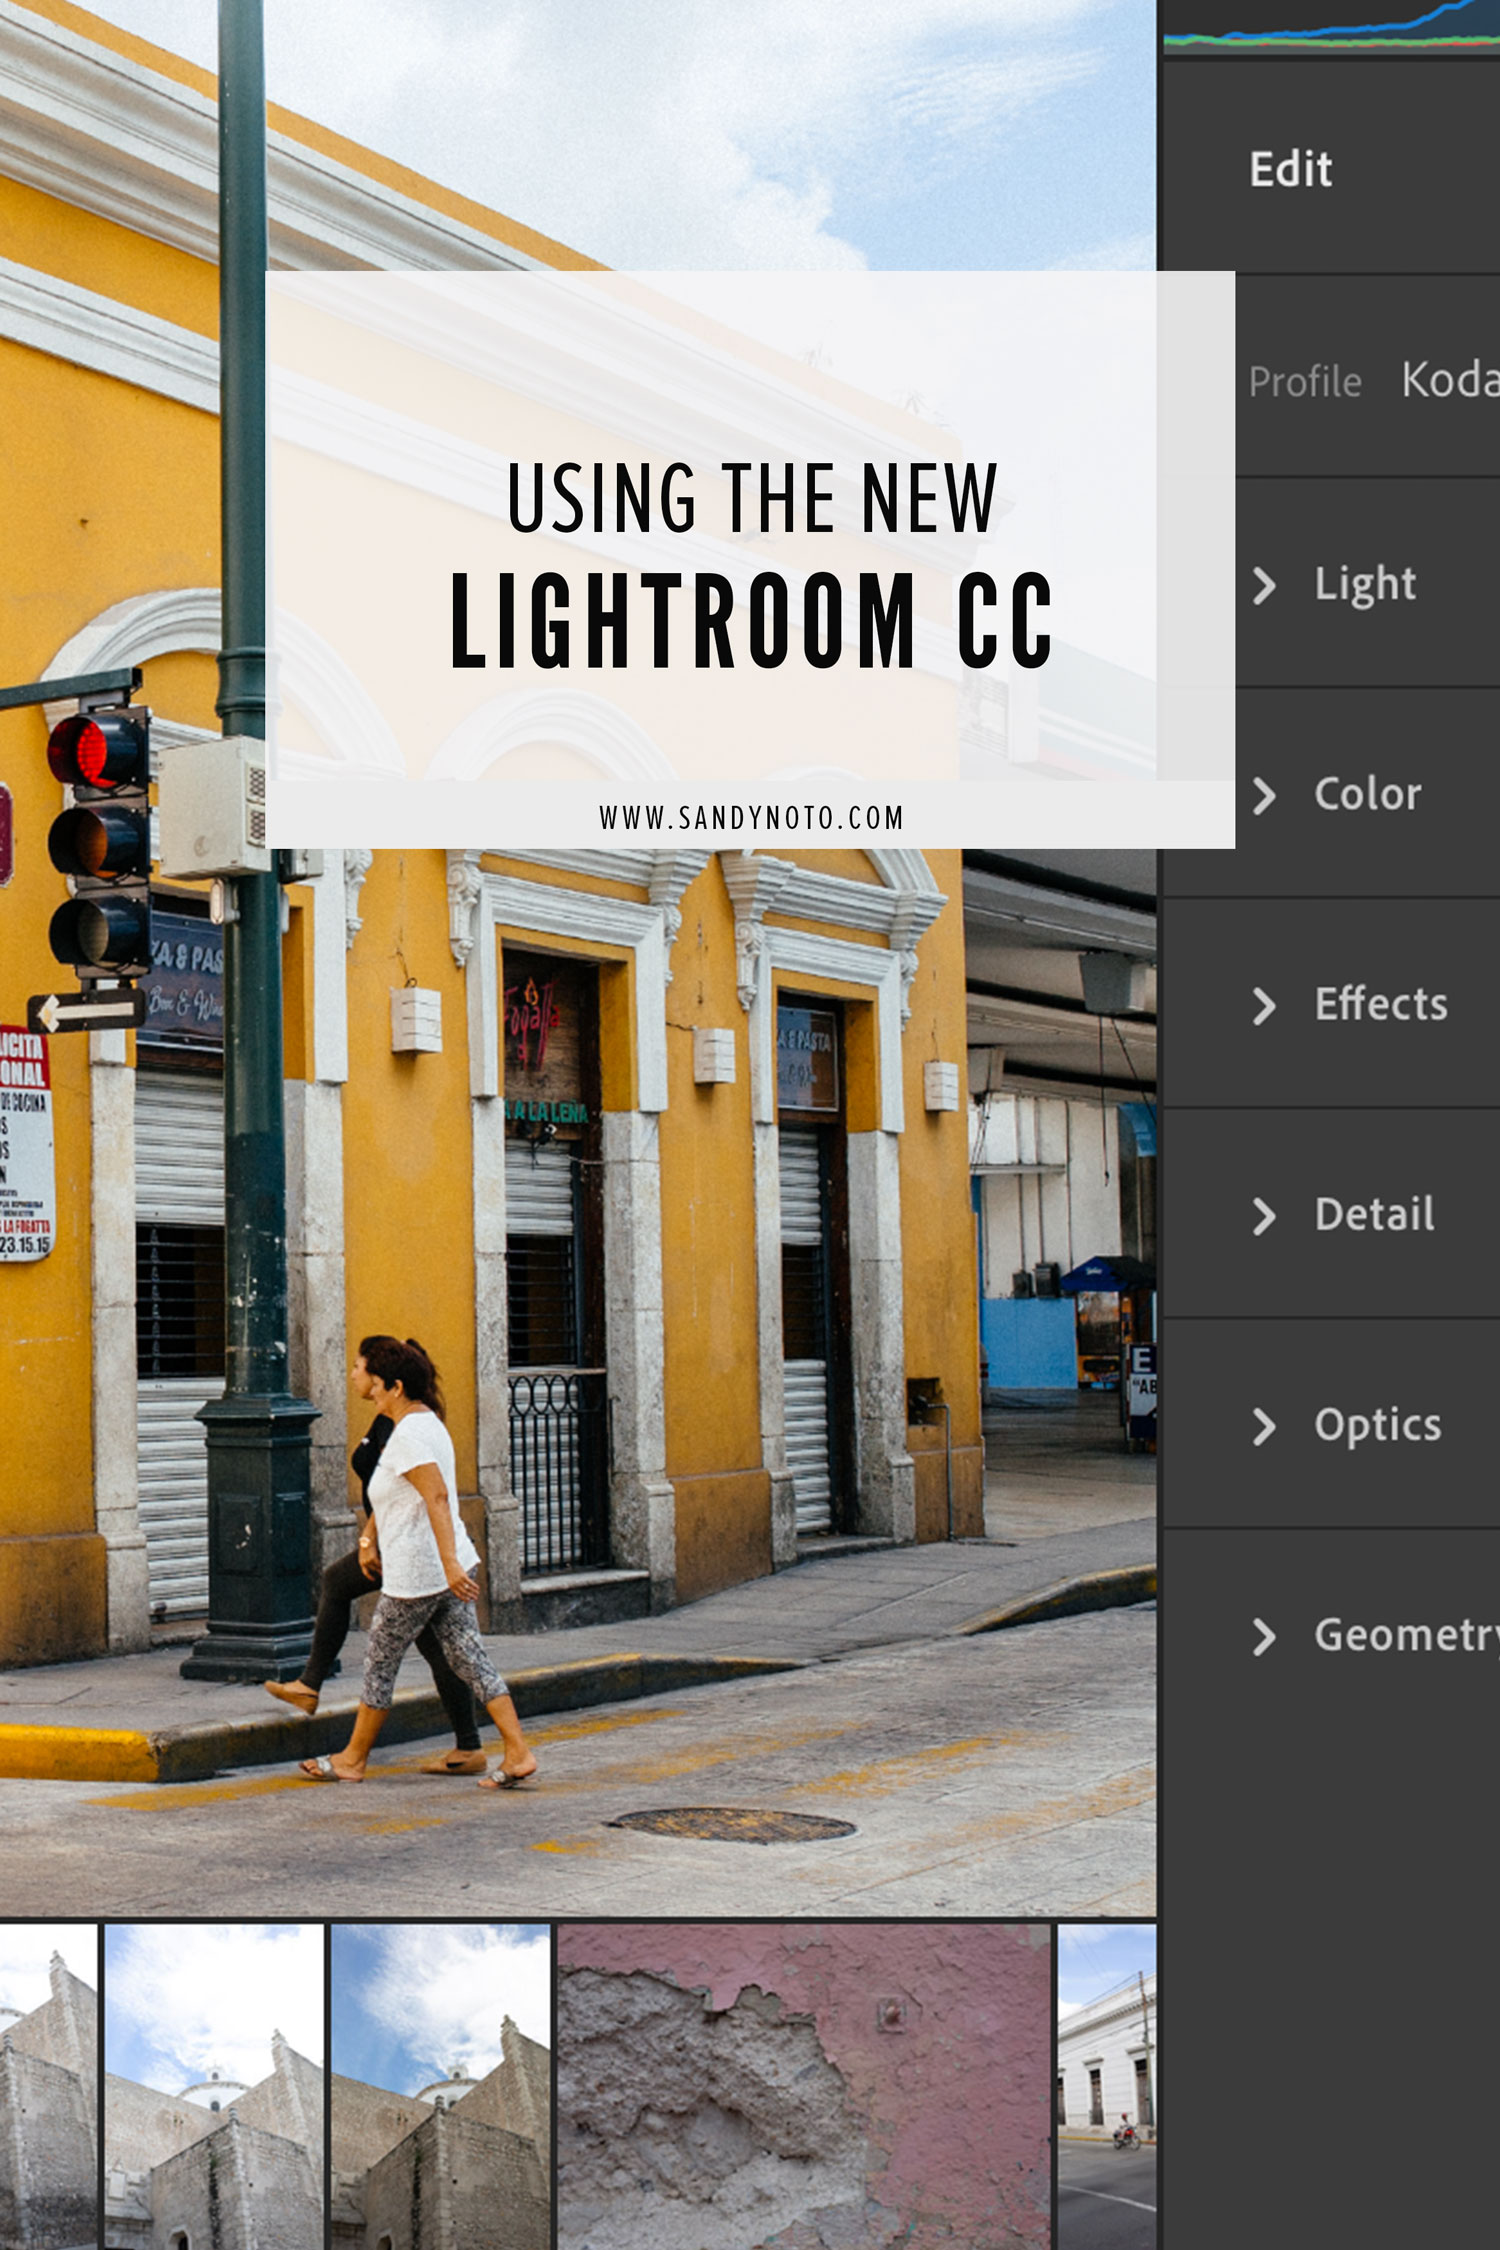 Using Lightroom CC